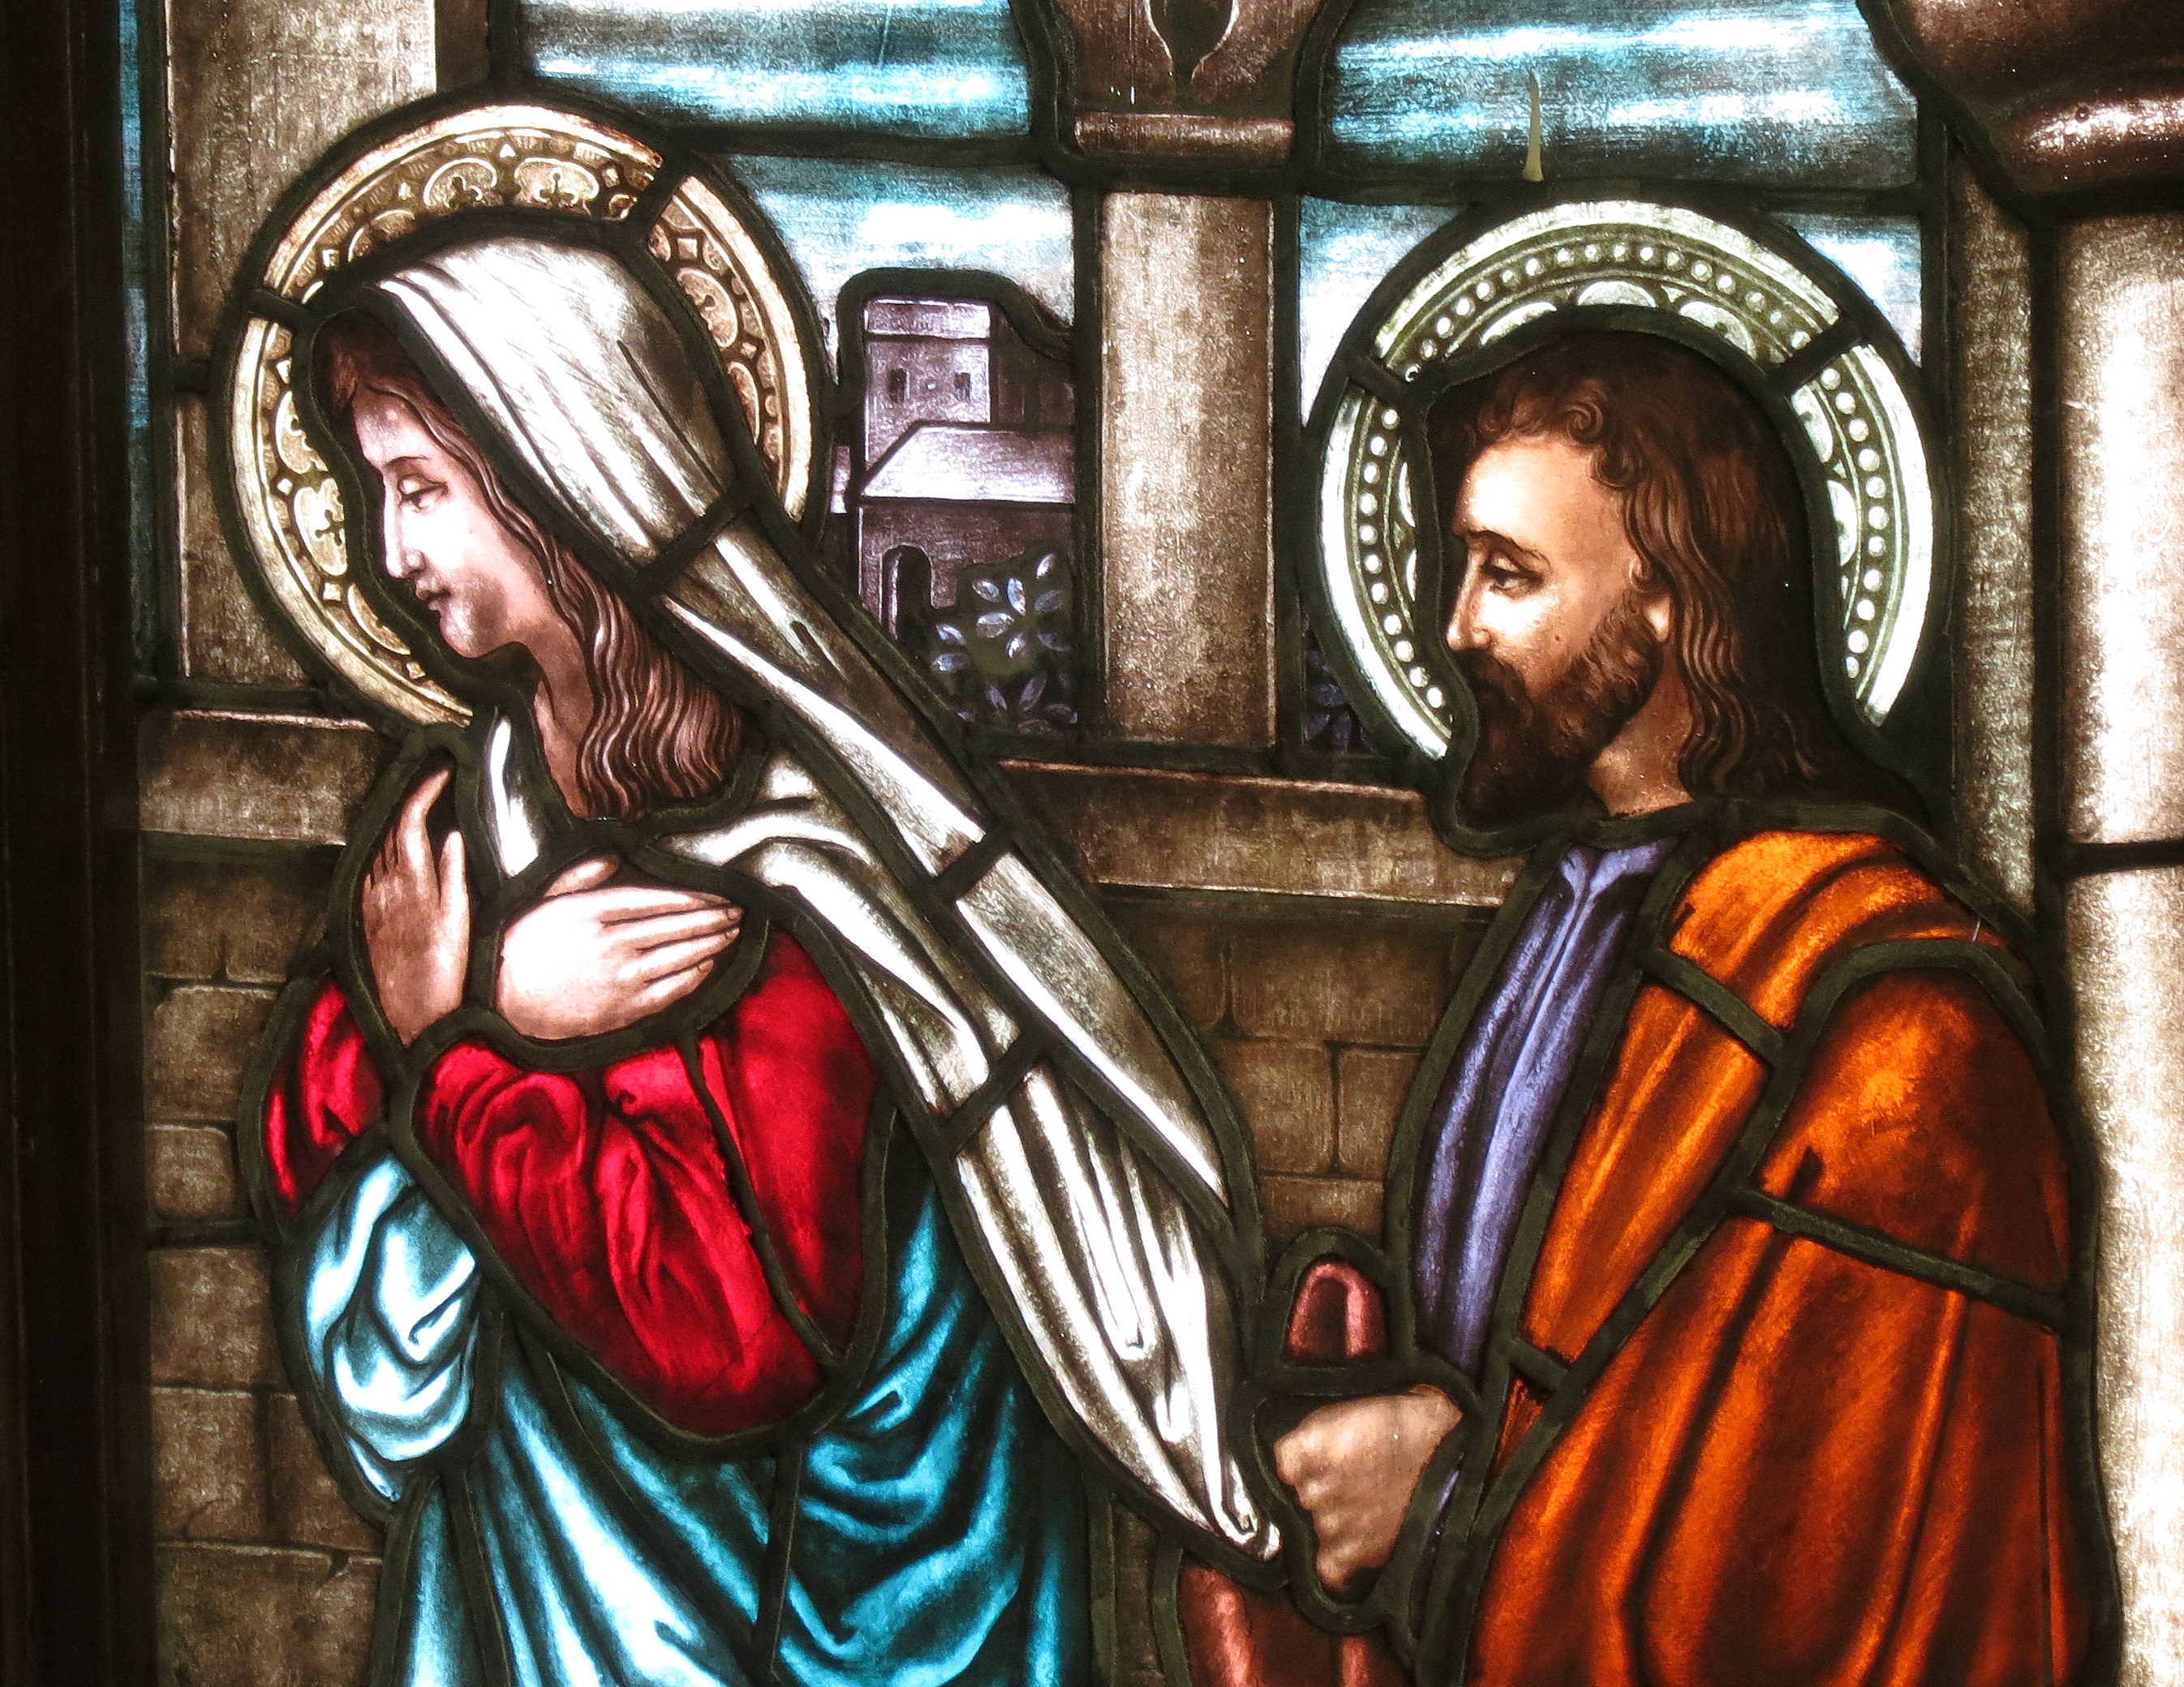 Saint_Bernard_Catholic_Church_(Corning,_Ohio)_-_stained_glass,_Presentation_of_the_Lord_detail_-_Mary_&_Joseph